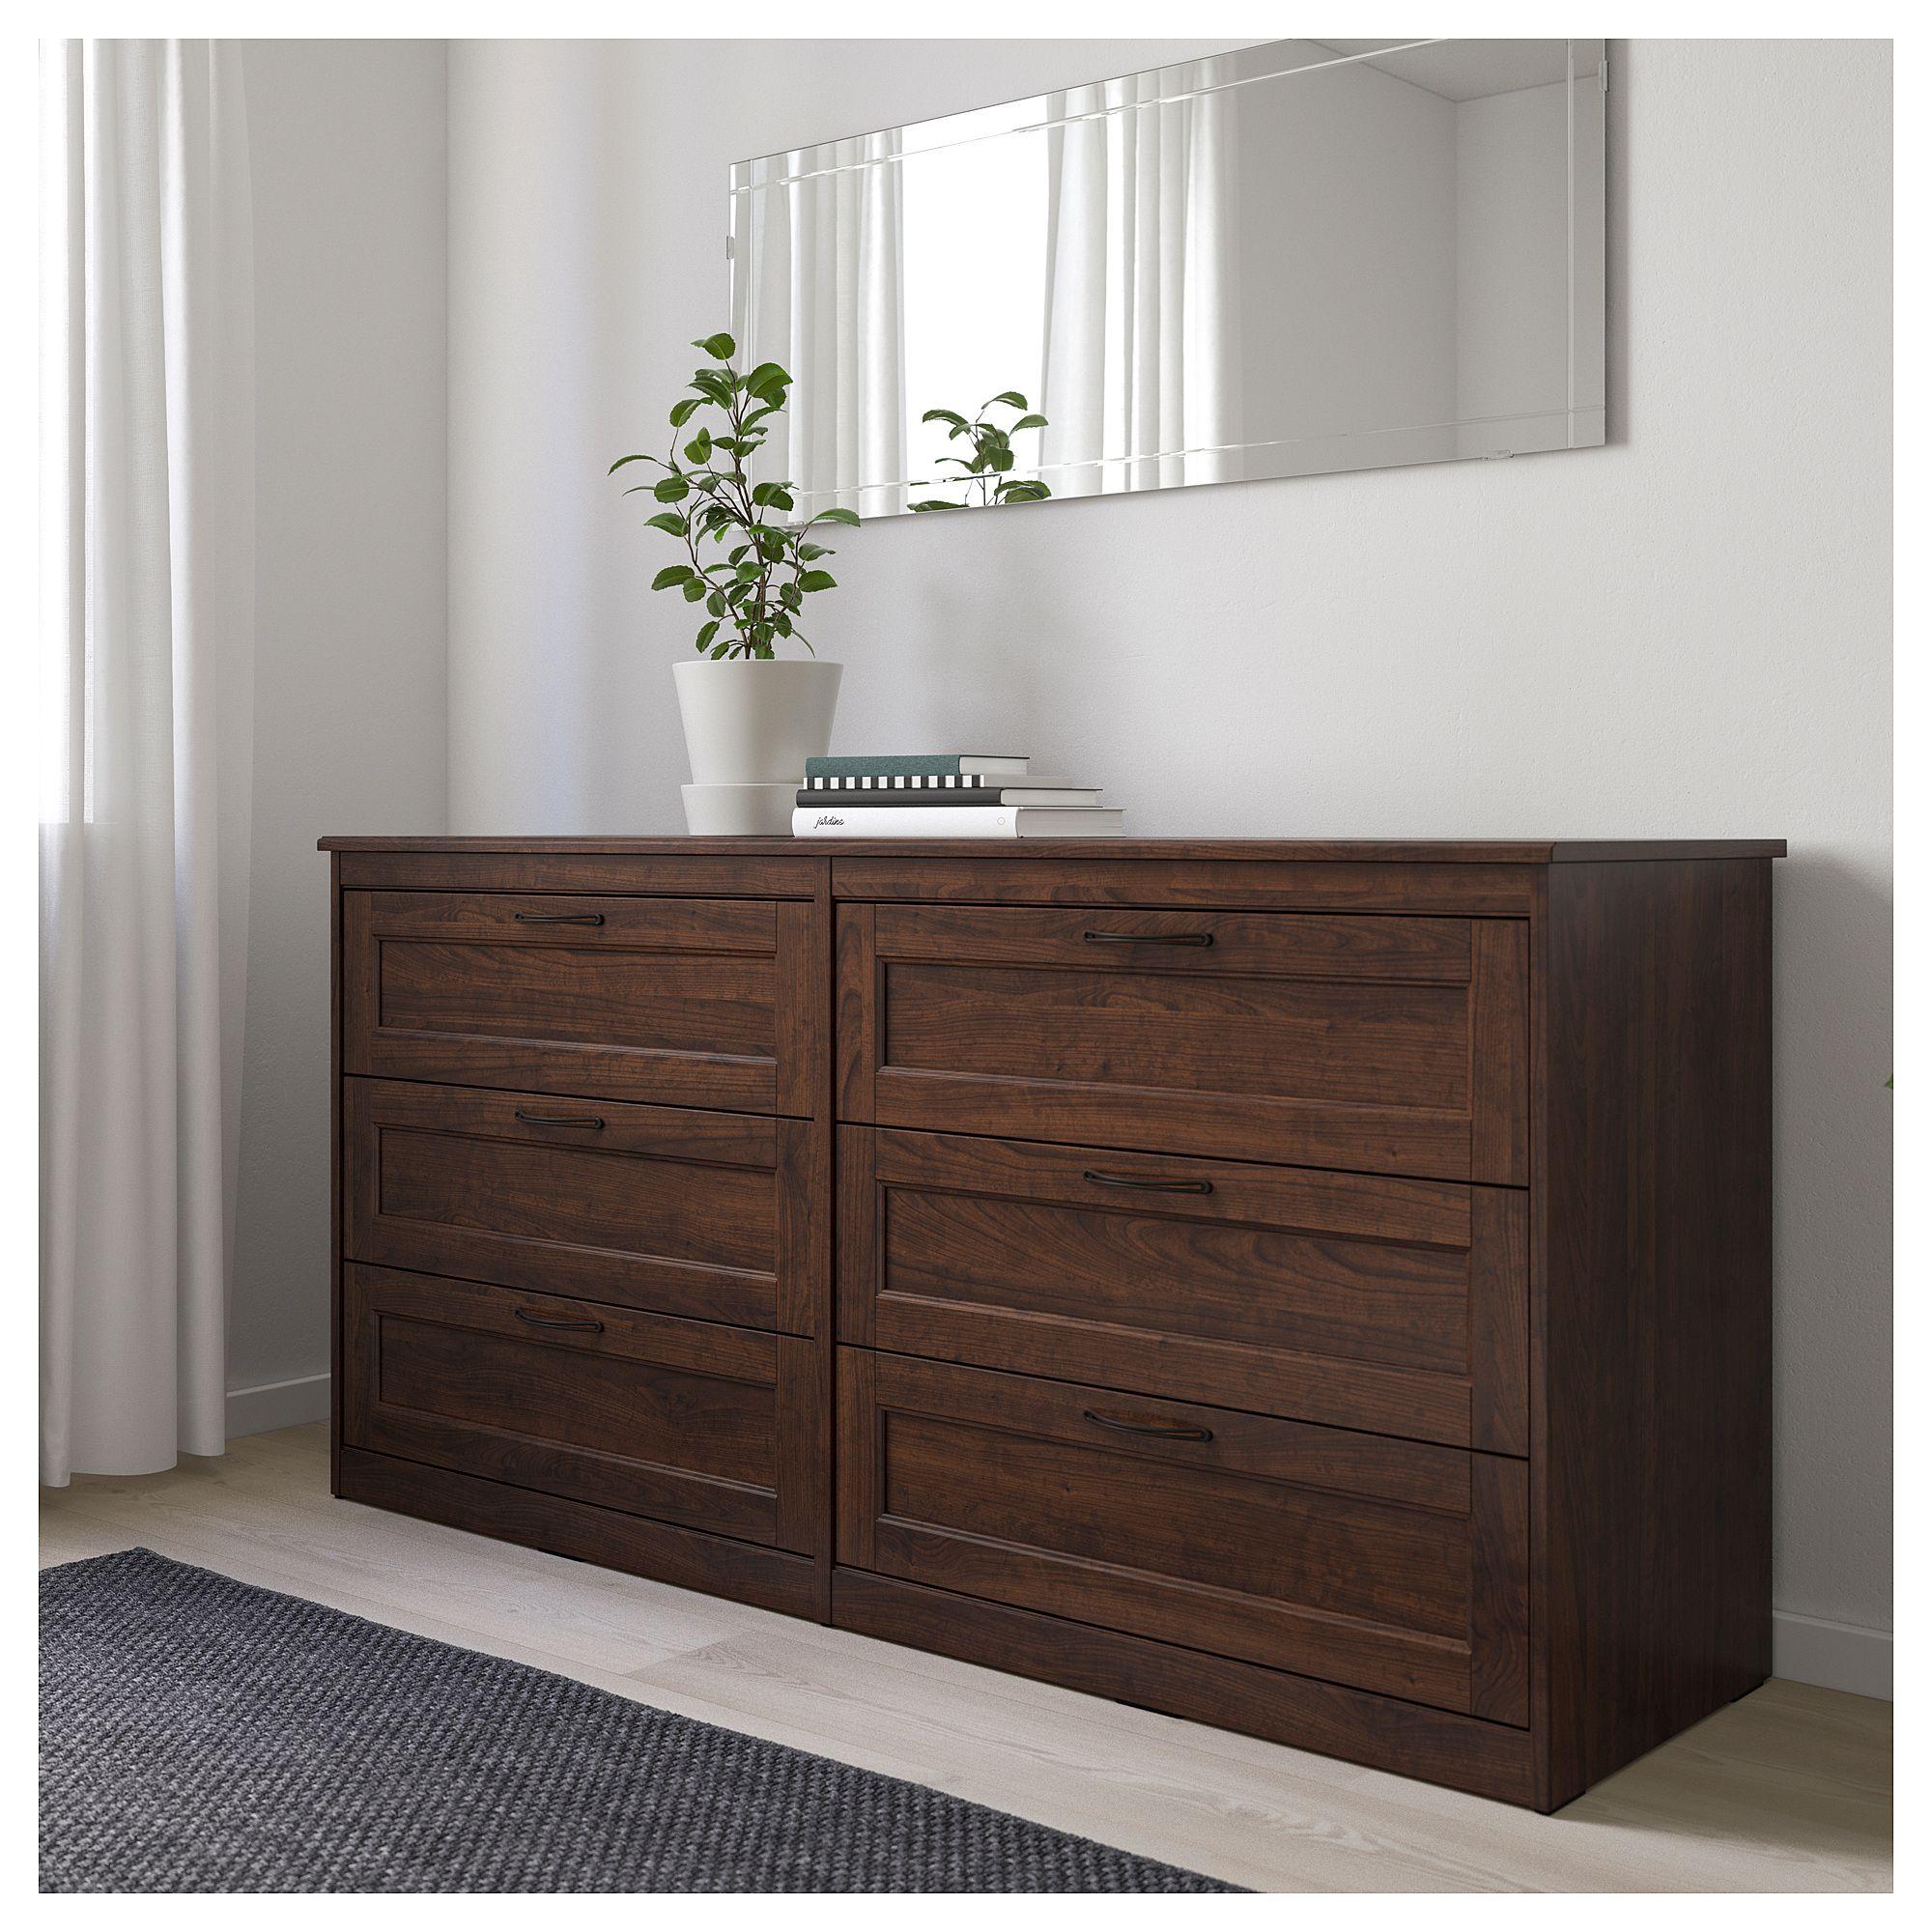 Dresser 55 Inches Wide